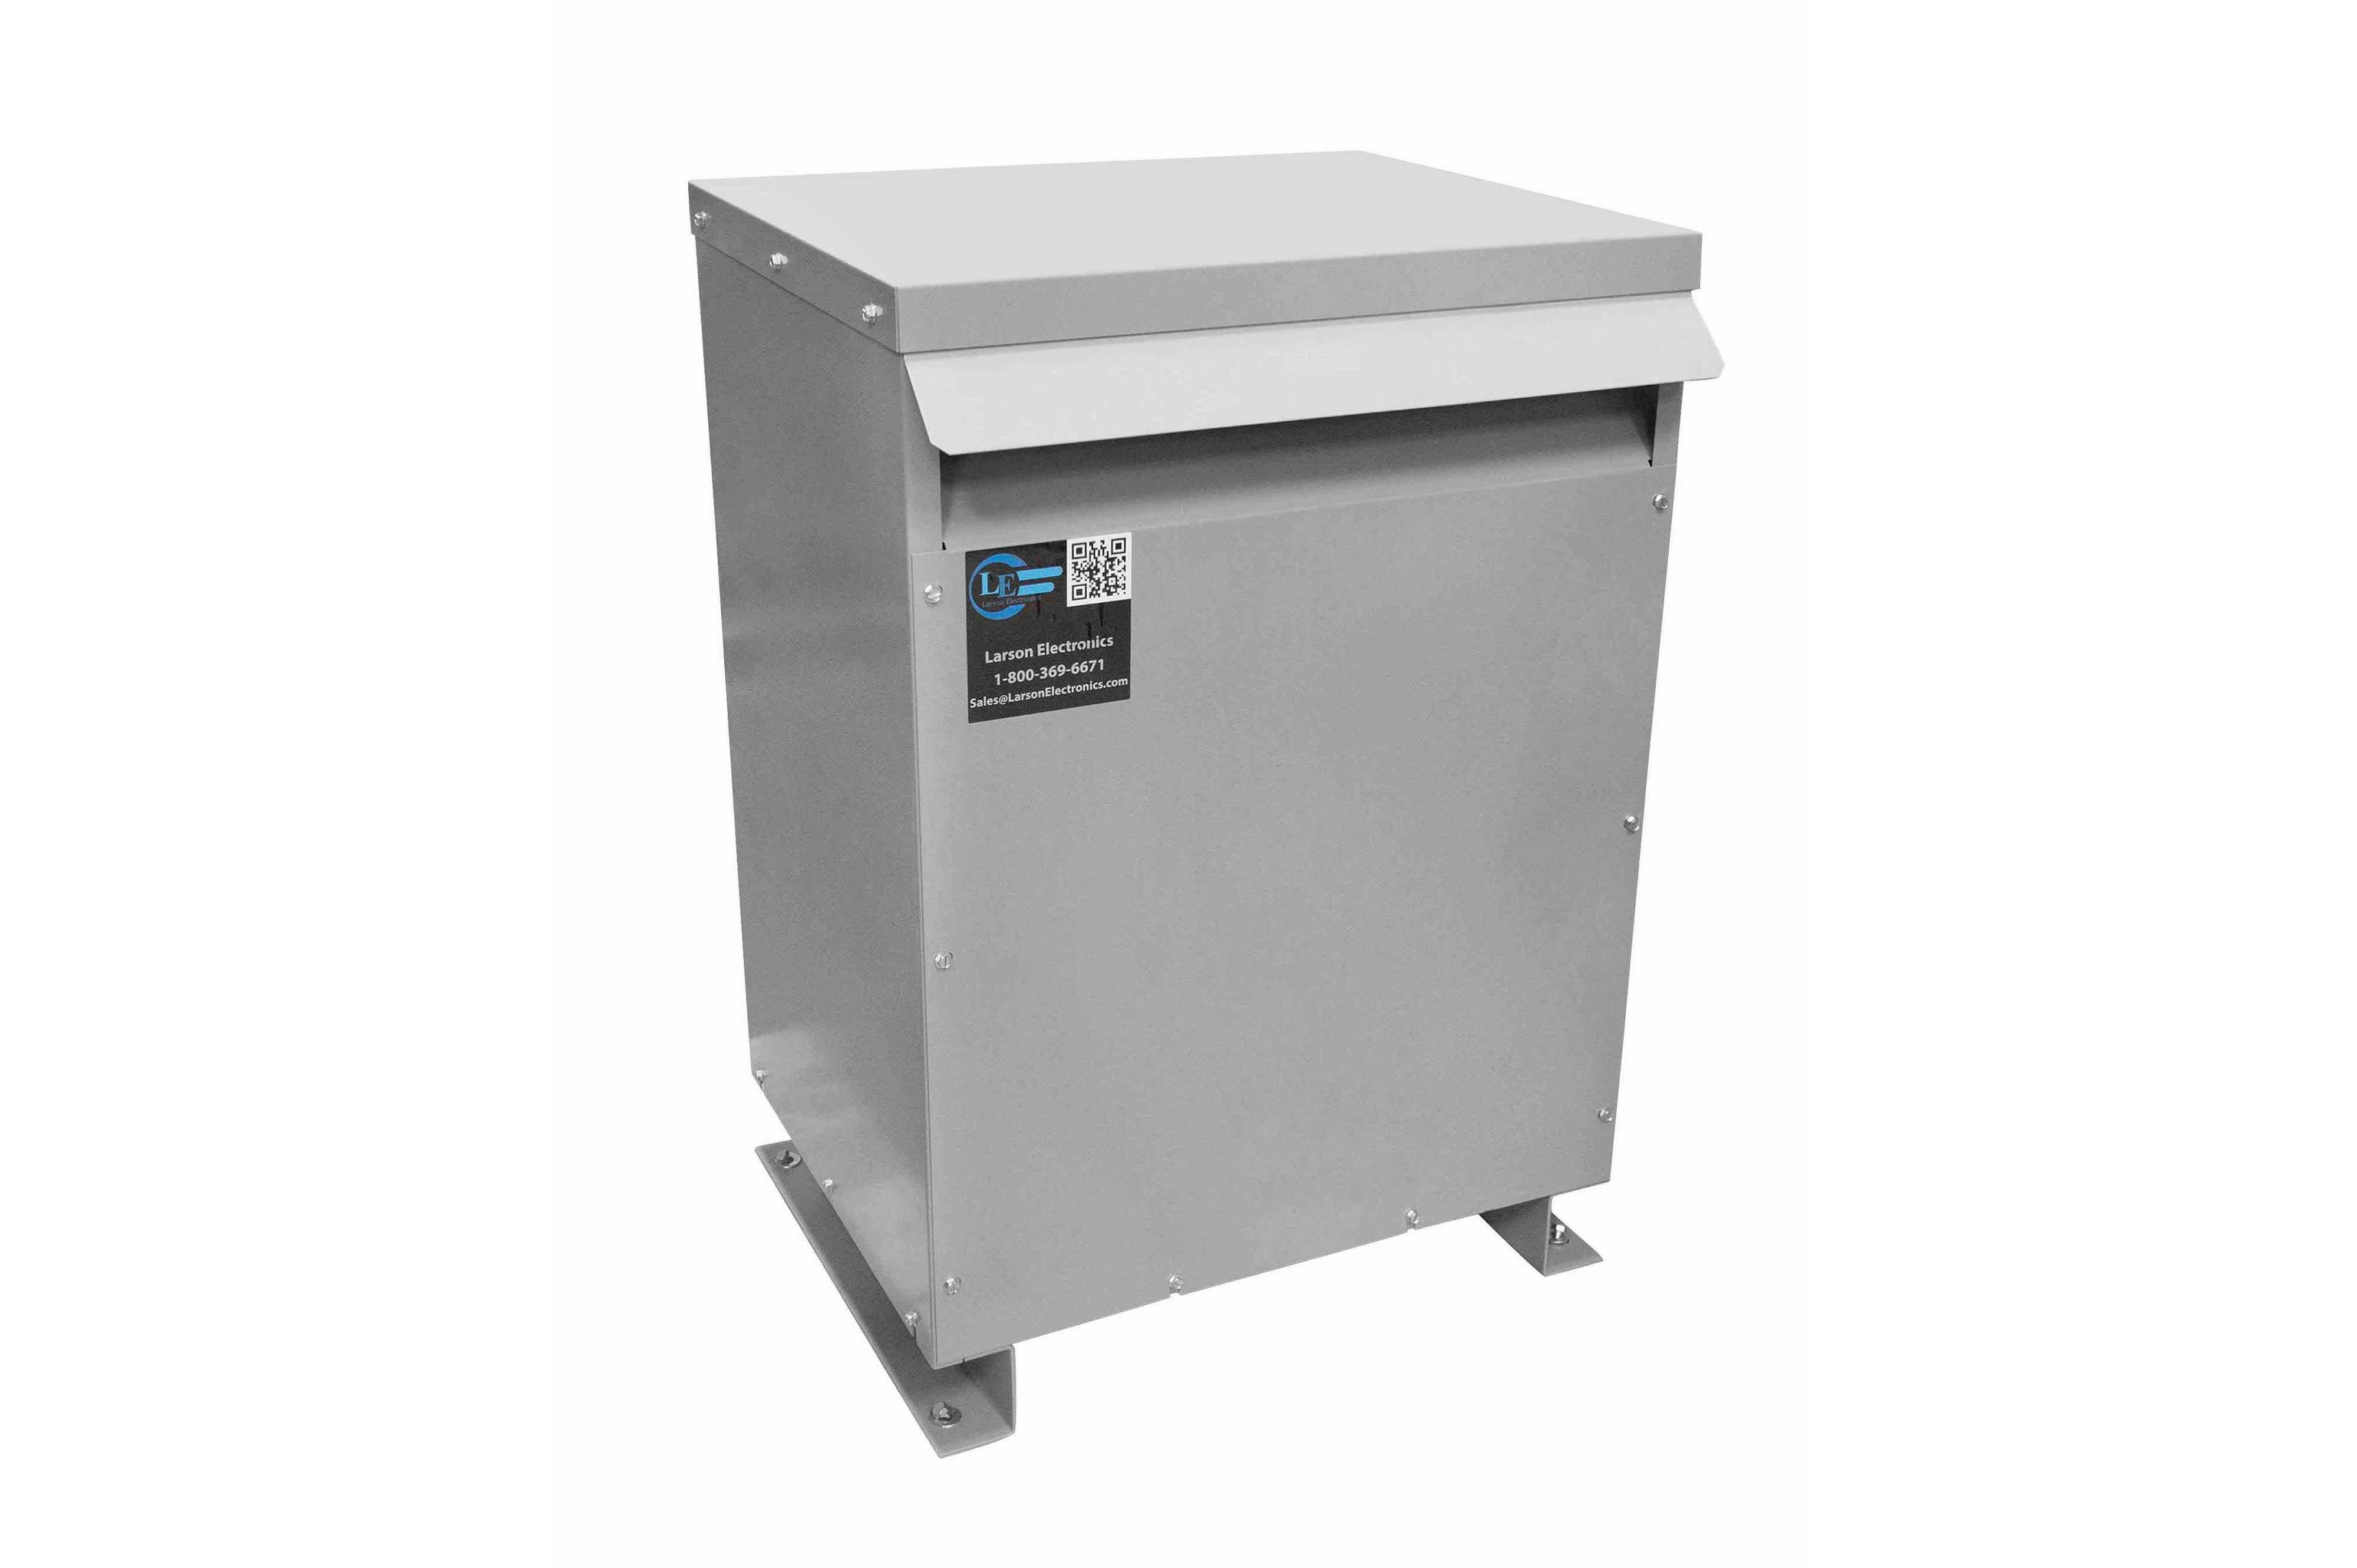 750 kVA 3PH Isolation Transformer, 208V Wye Primary, 415V Delta Secondary, N3R, Ventilated, 60 Hz